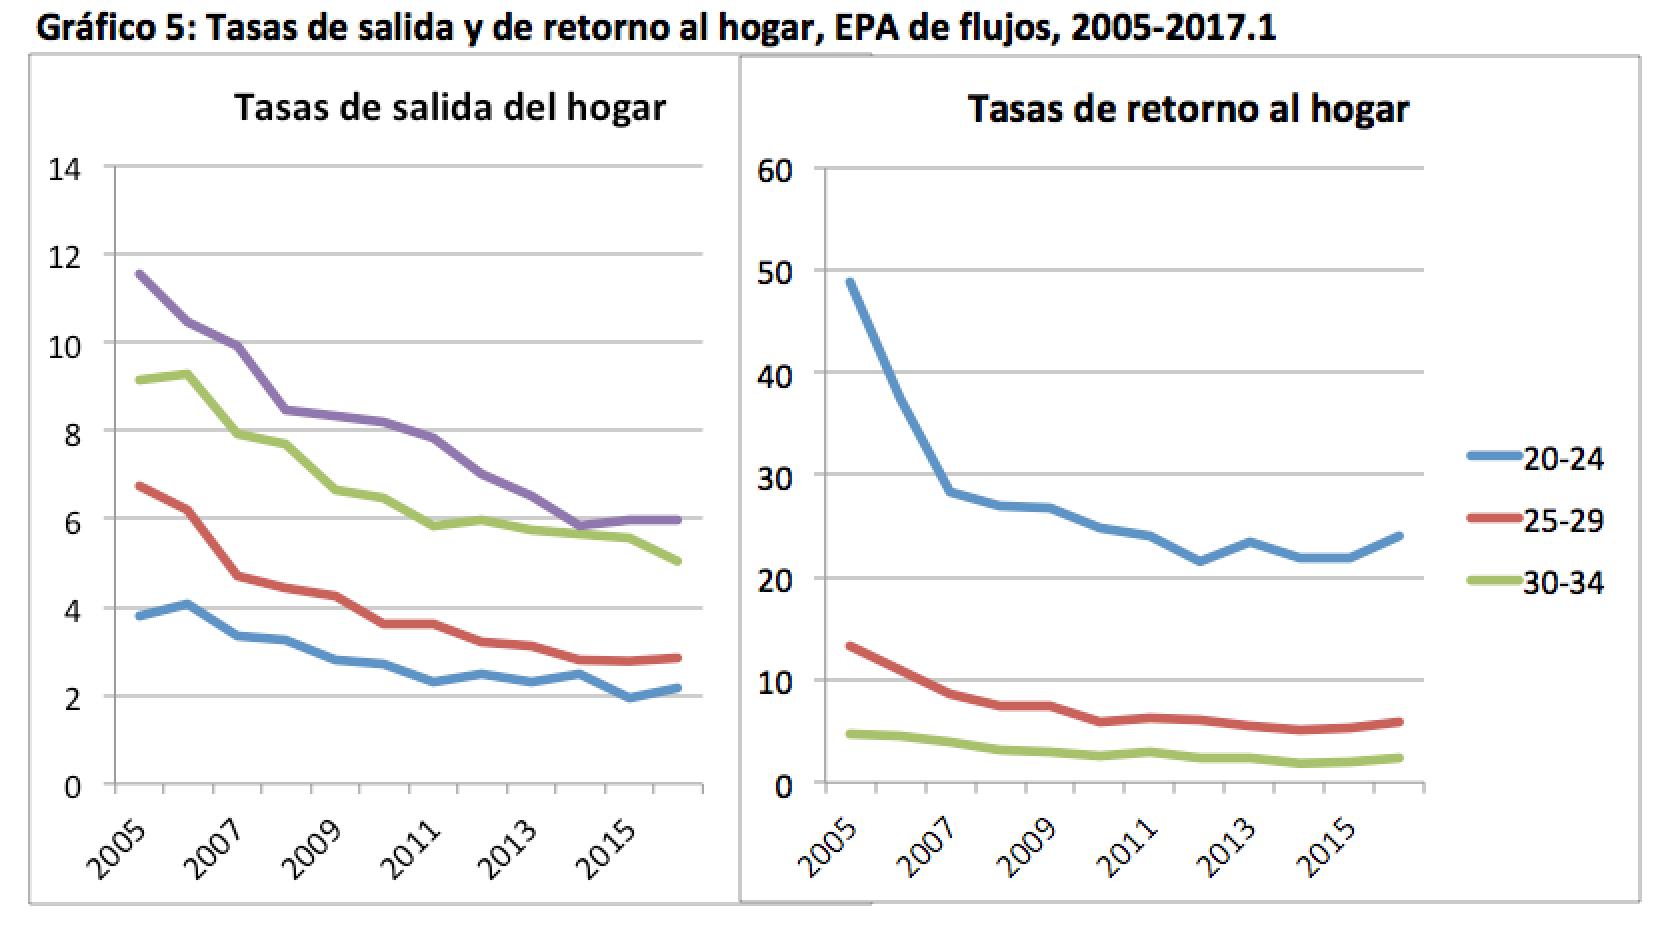 Graf5_ tasas de salida y retorno EPA